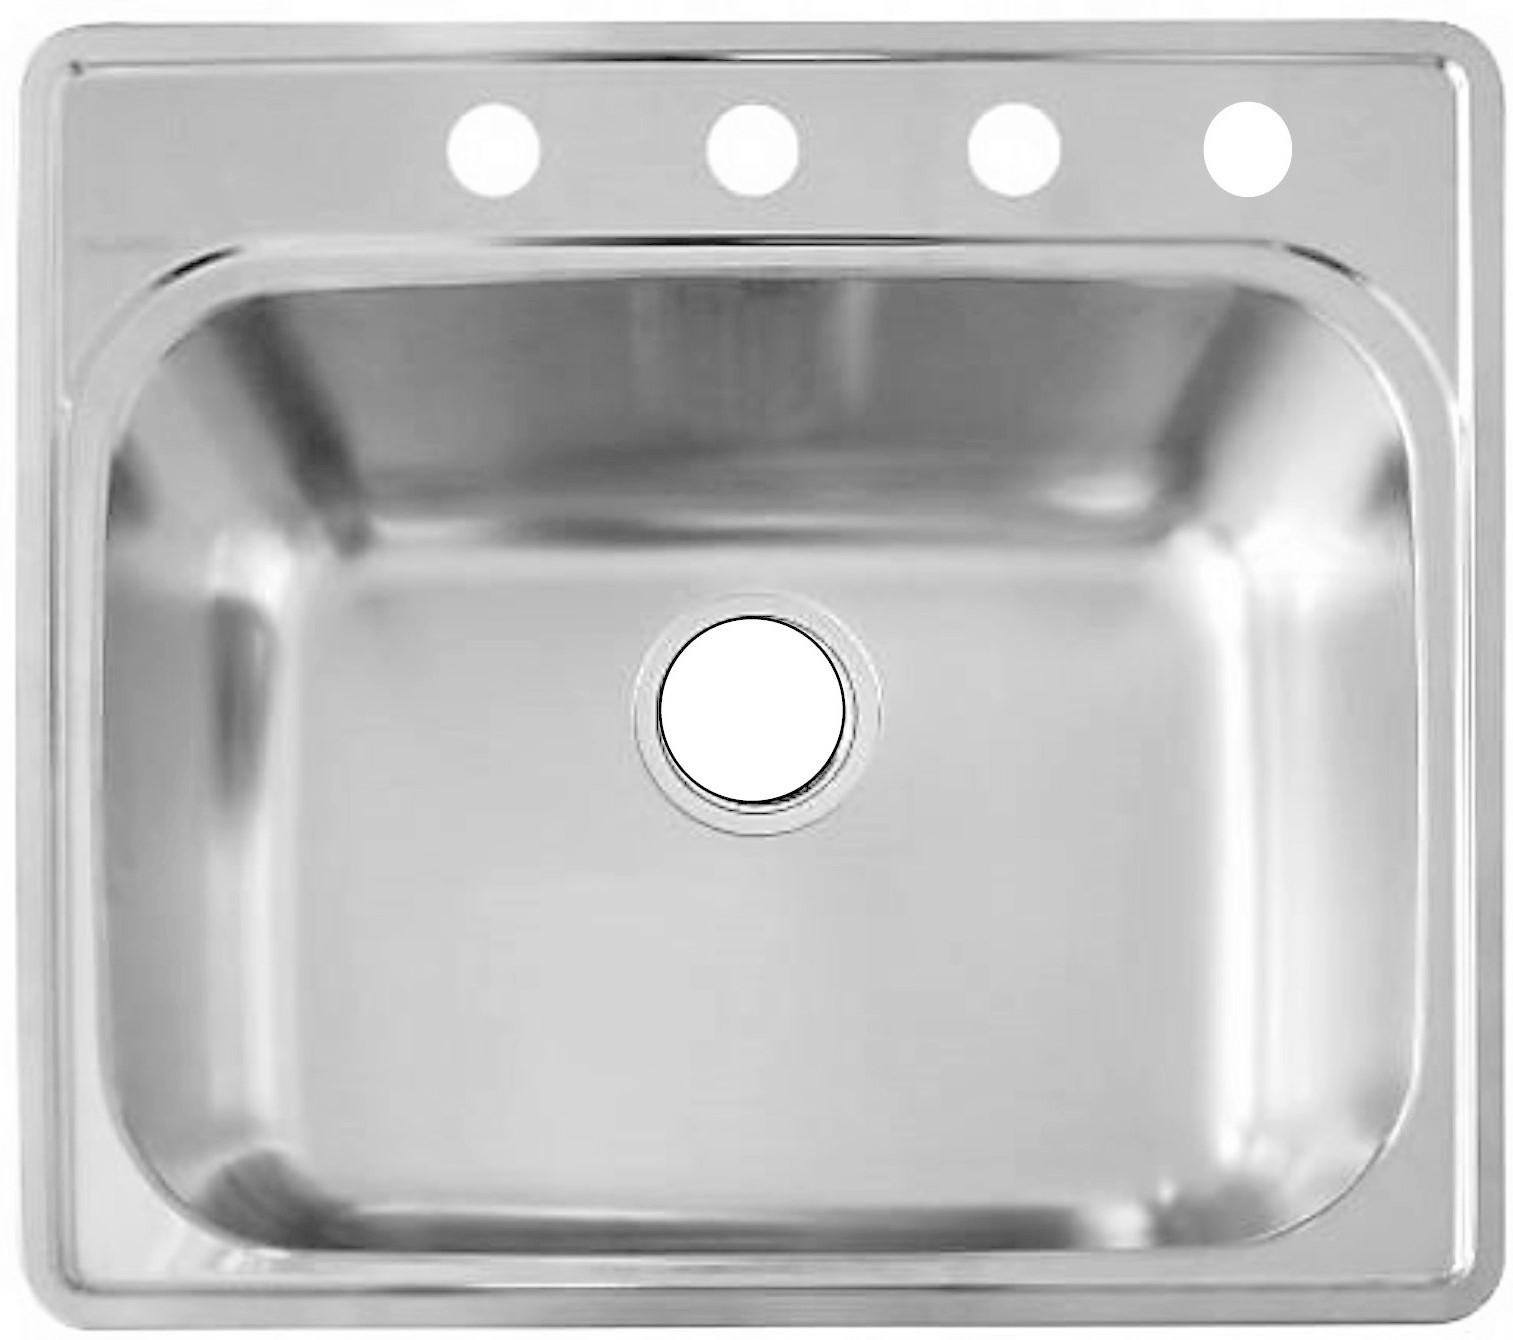 as 25 22 8 20g single bowl topmount builder stainless steel kitchen sink single bowl kitchen sink Topmount SS Kitchen Sink